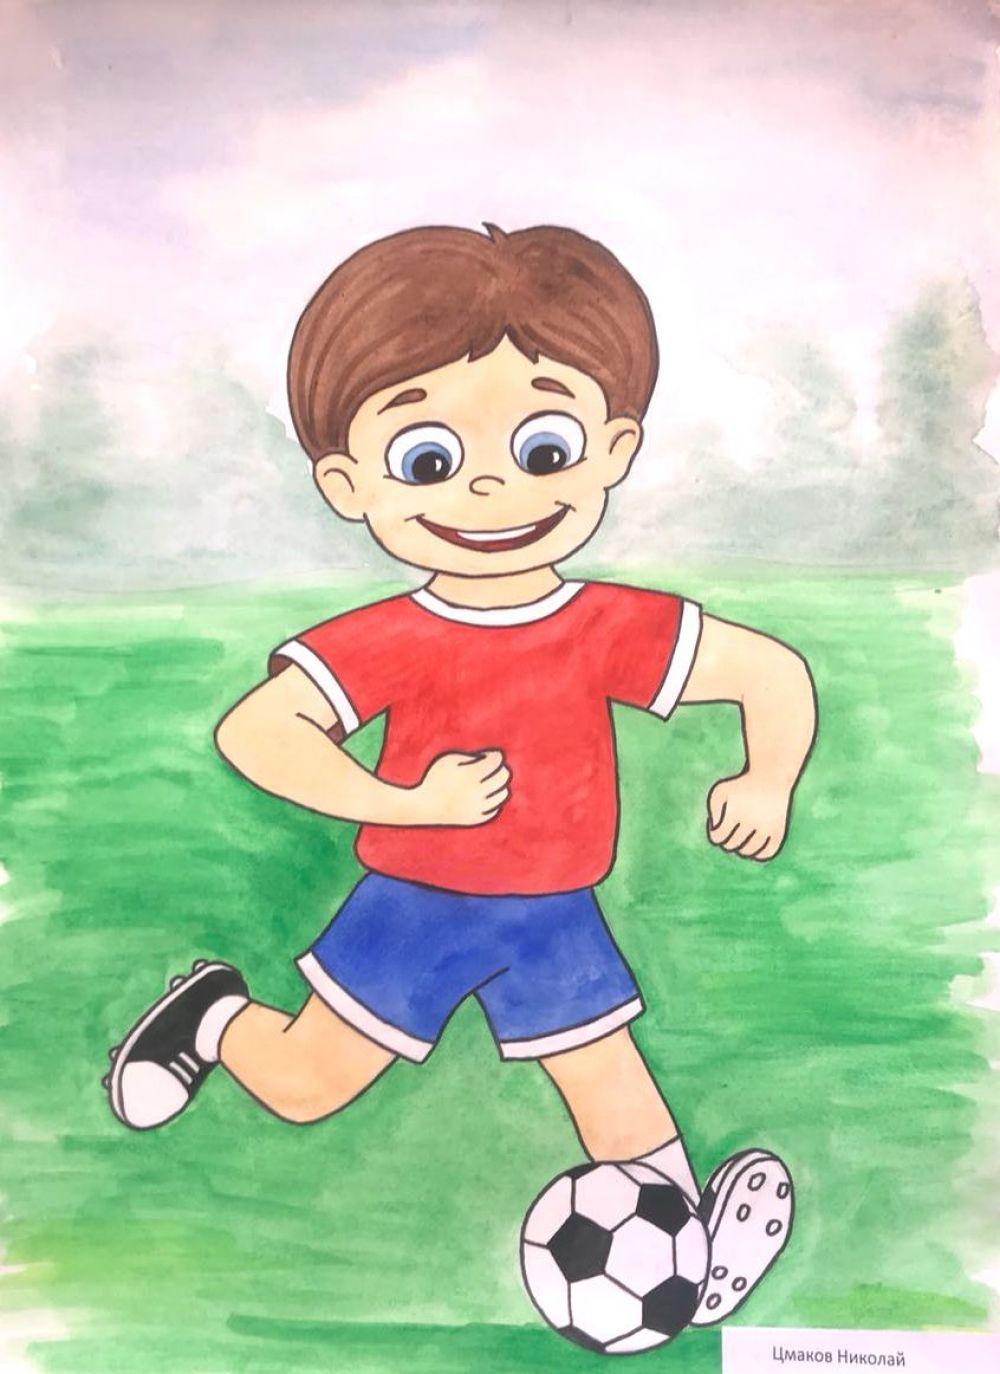 Цмаков Николай, 9 лет, Пятигорск